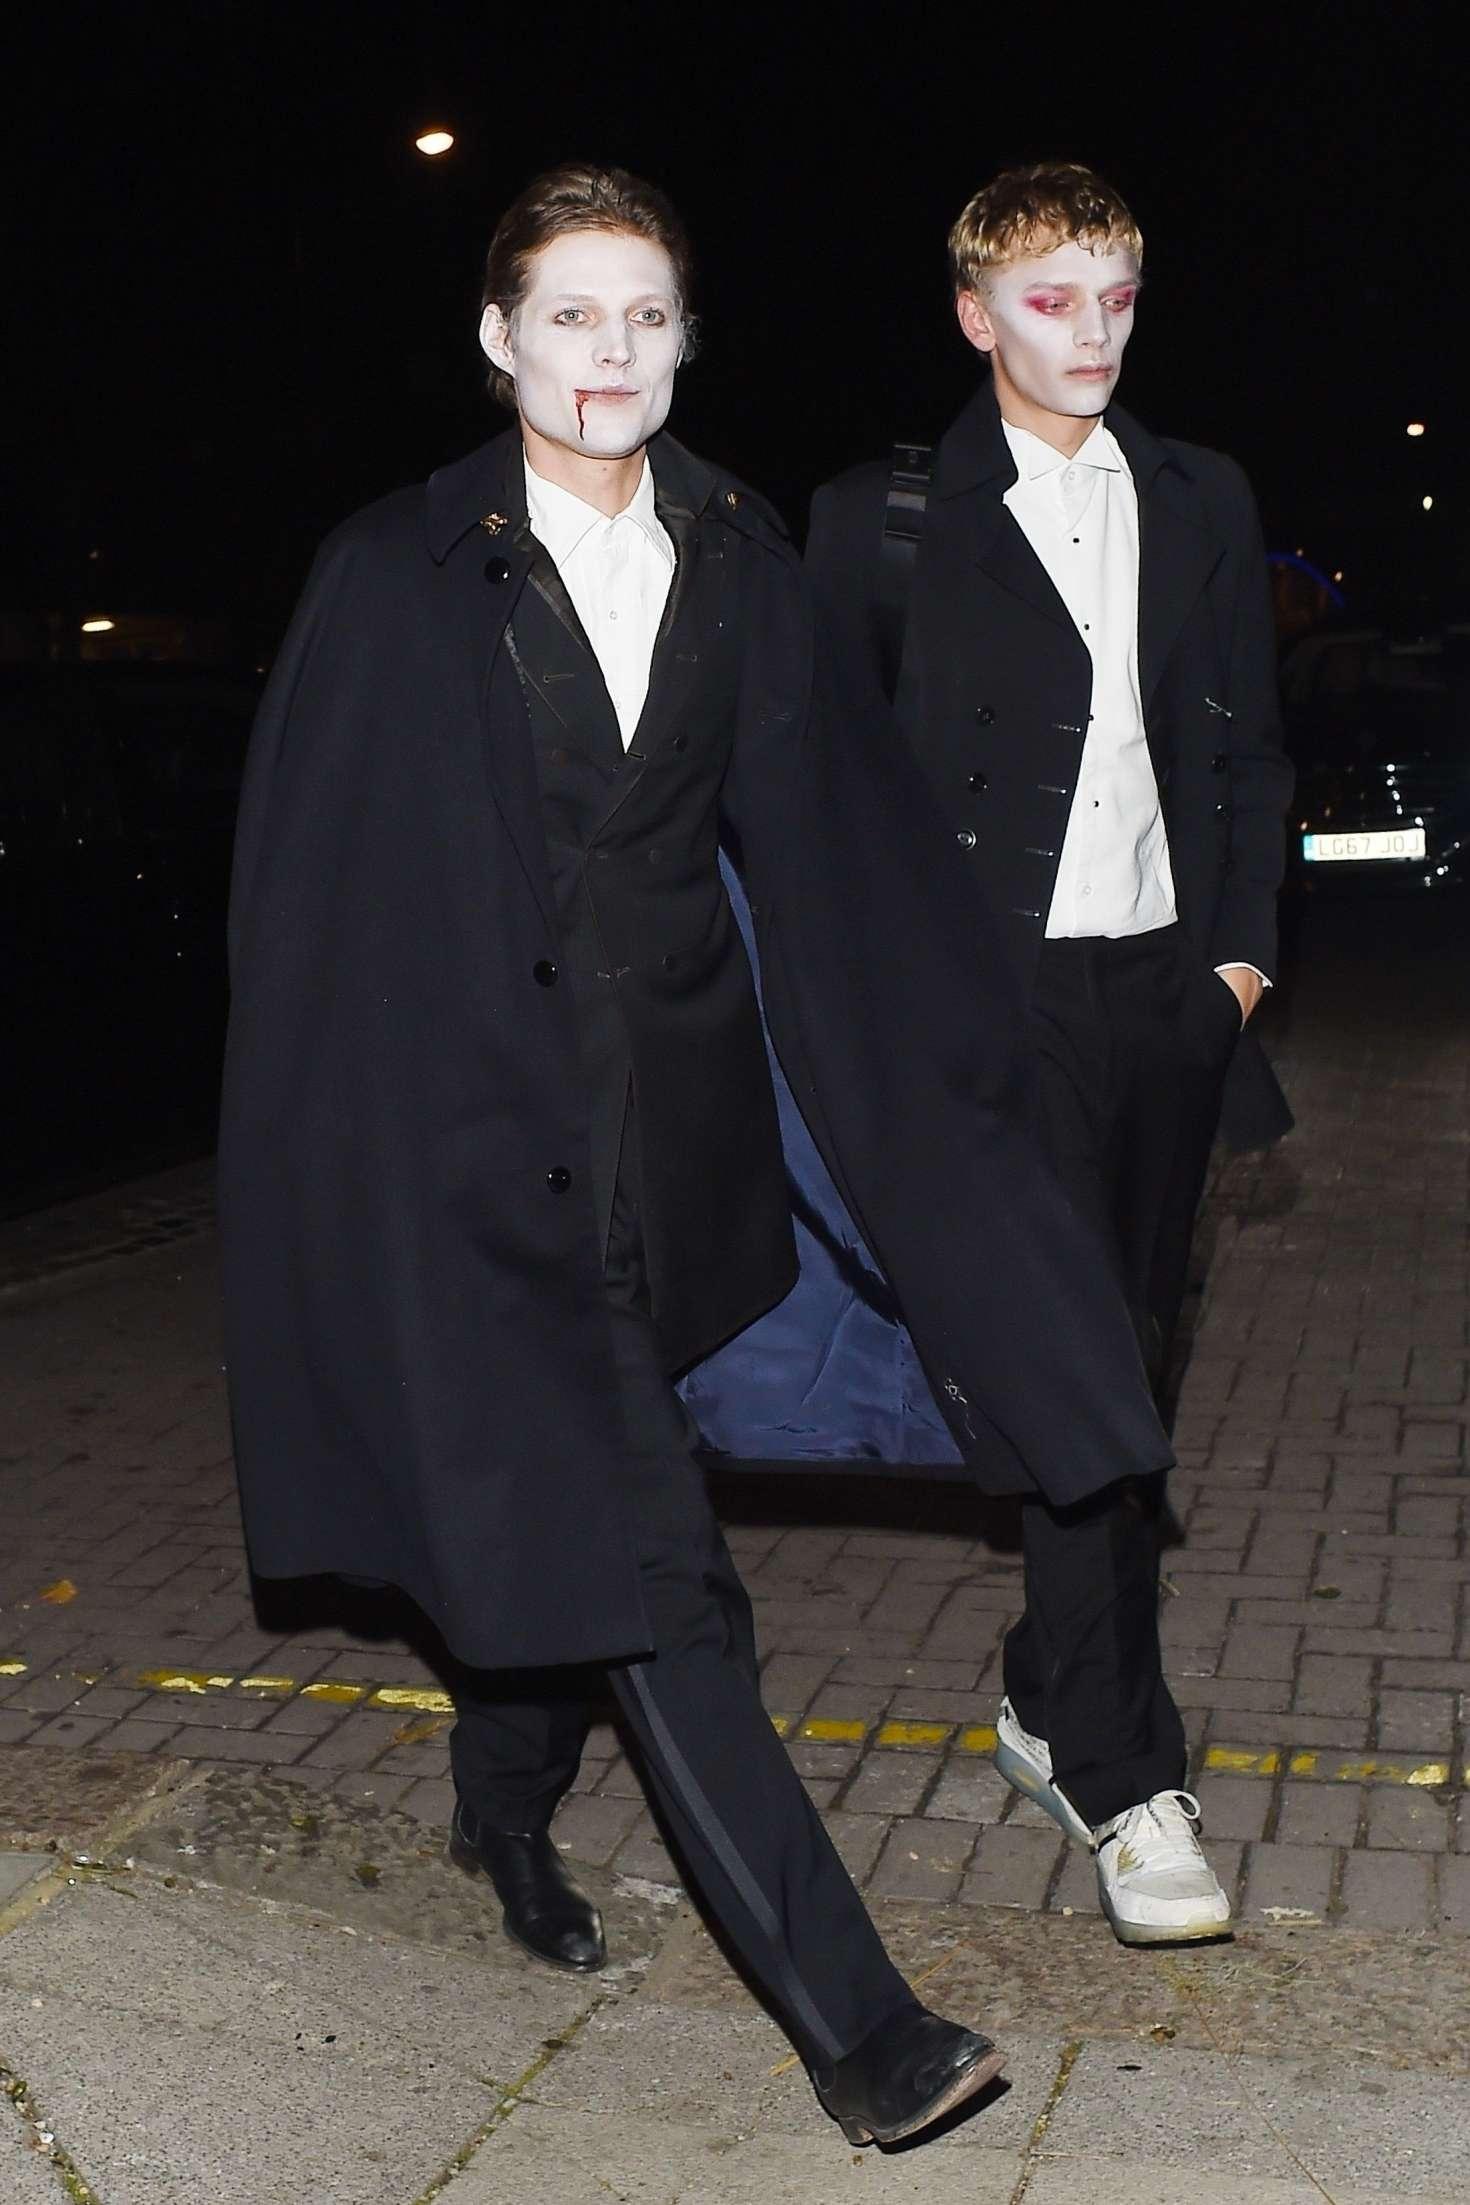 Bismarck Halloween Party 2020 Kate Moss and Nikolai von Bismarck: Arriving at LAYLOW Halloween